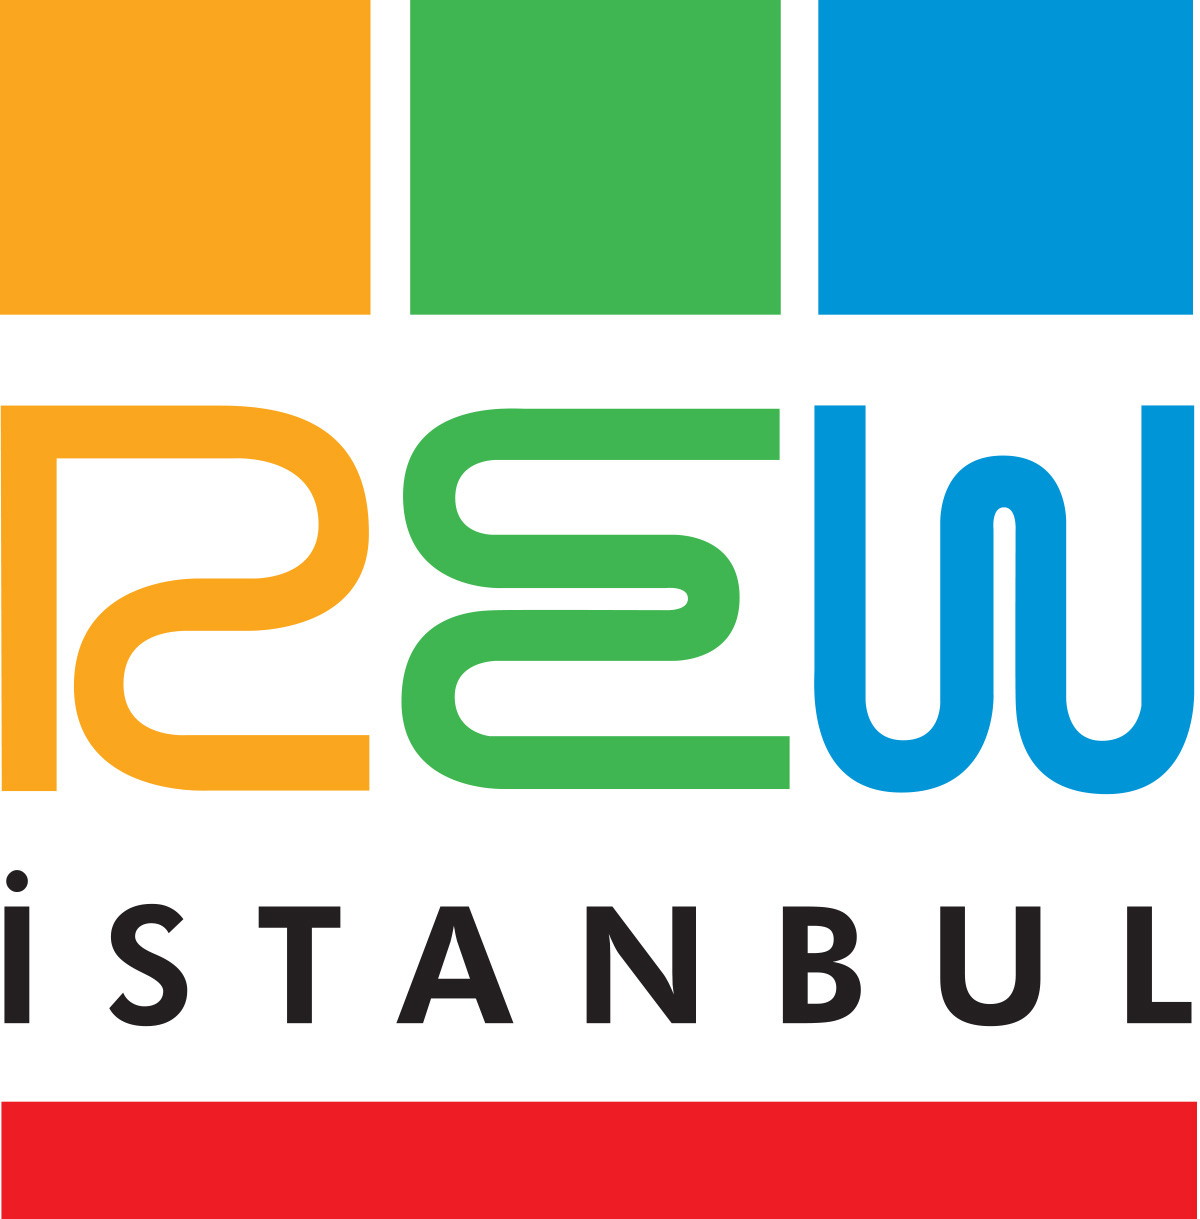 İstanbul Rew Fuarı 28-30 Nisan 2016